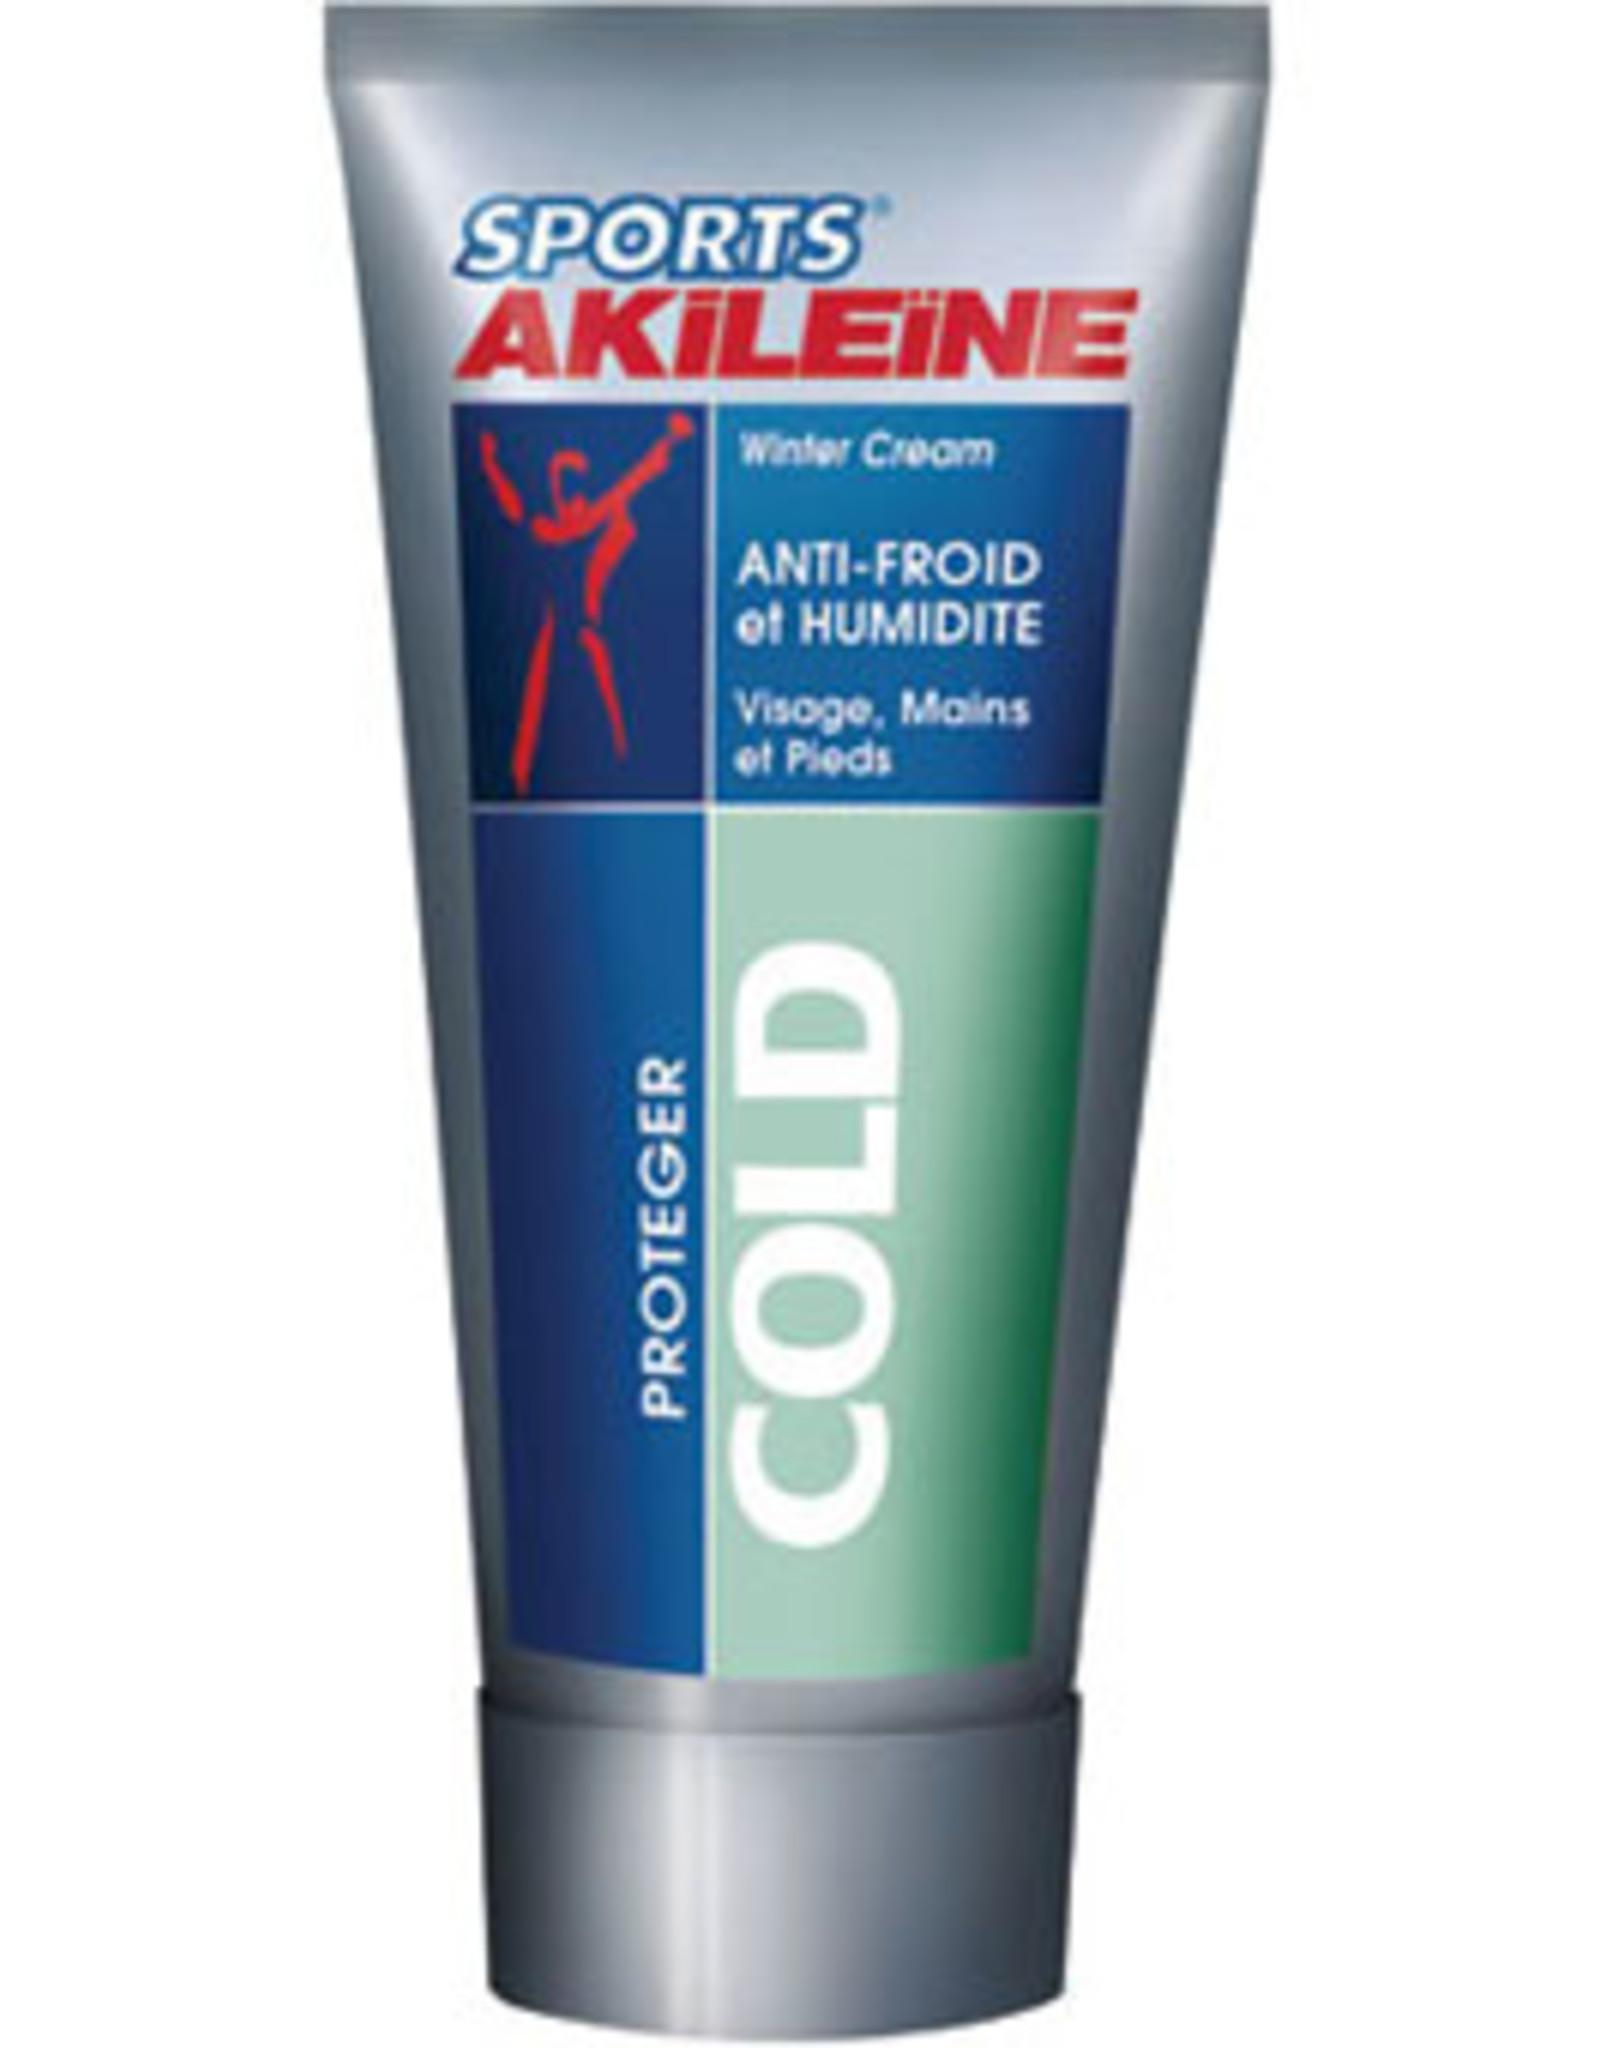 AKILEINE SPORTS CREME COLD